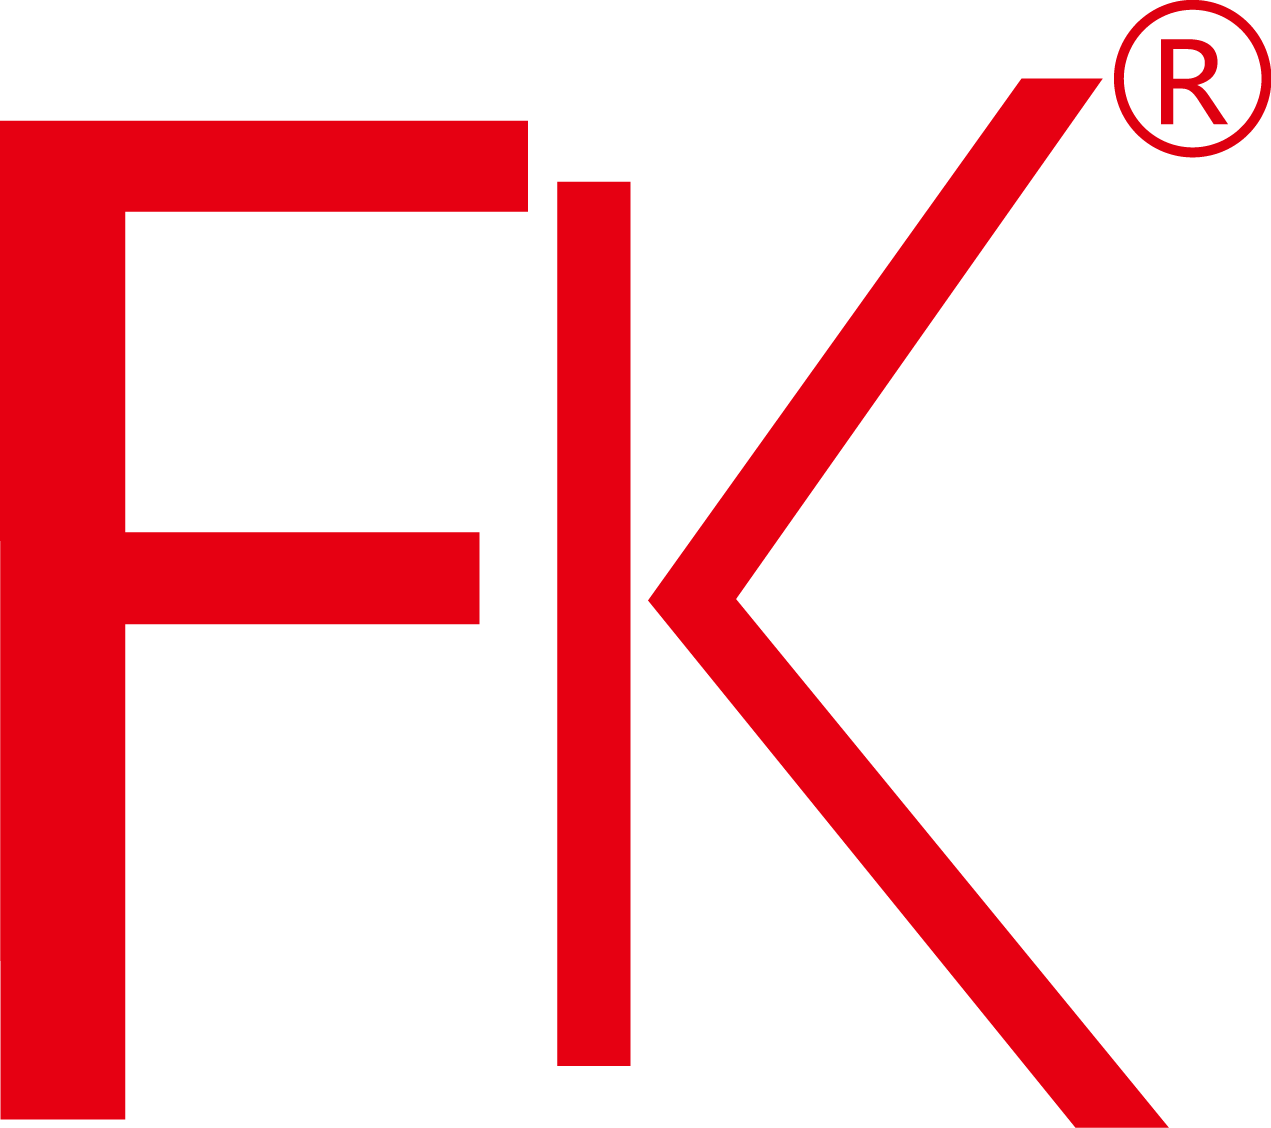 FK Bearing Brand